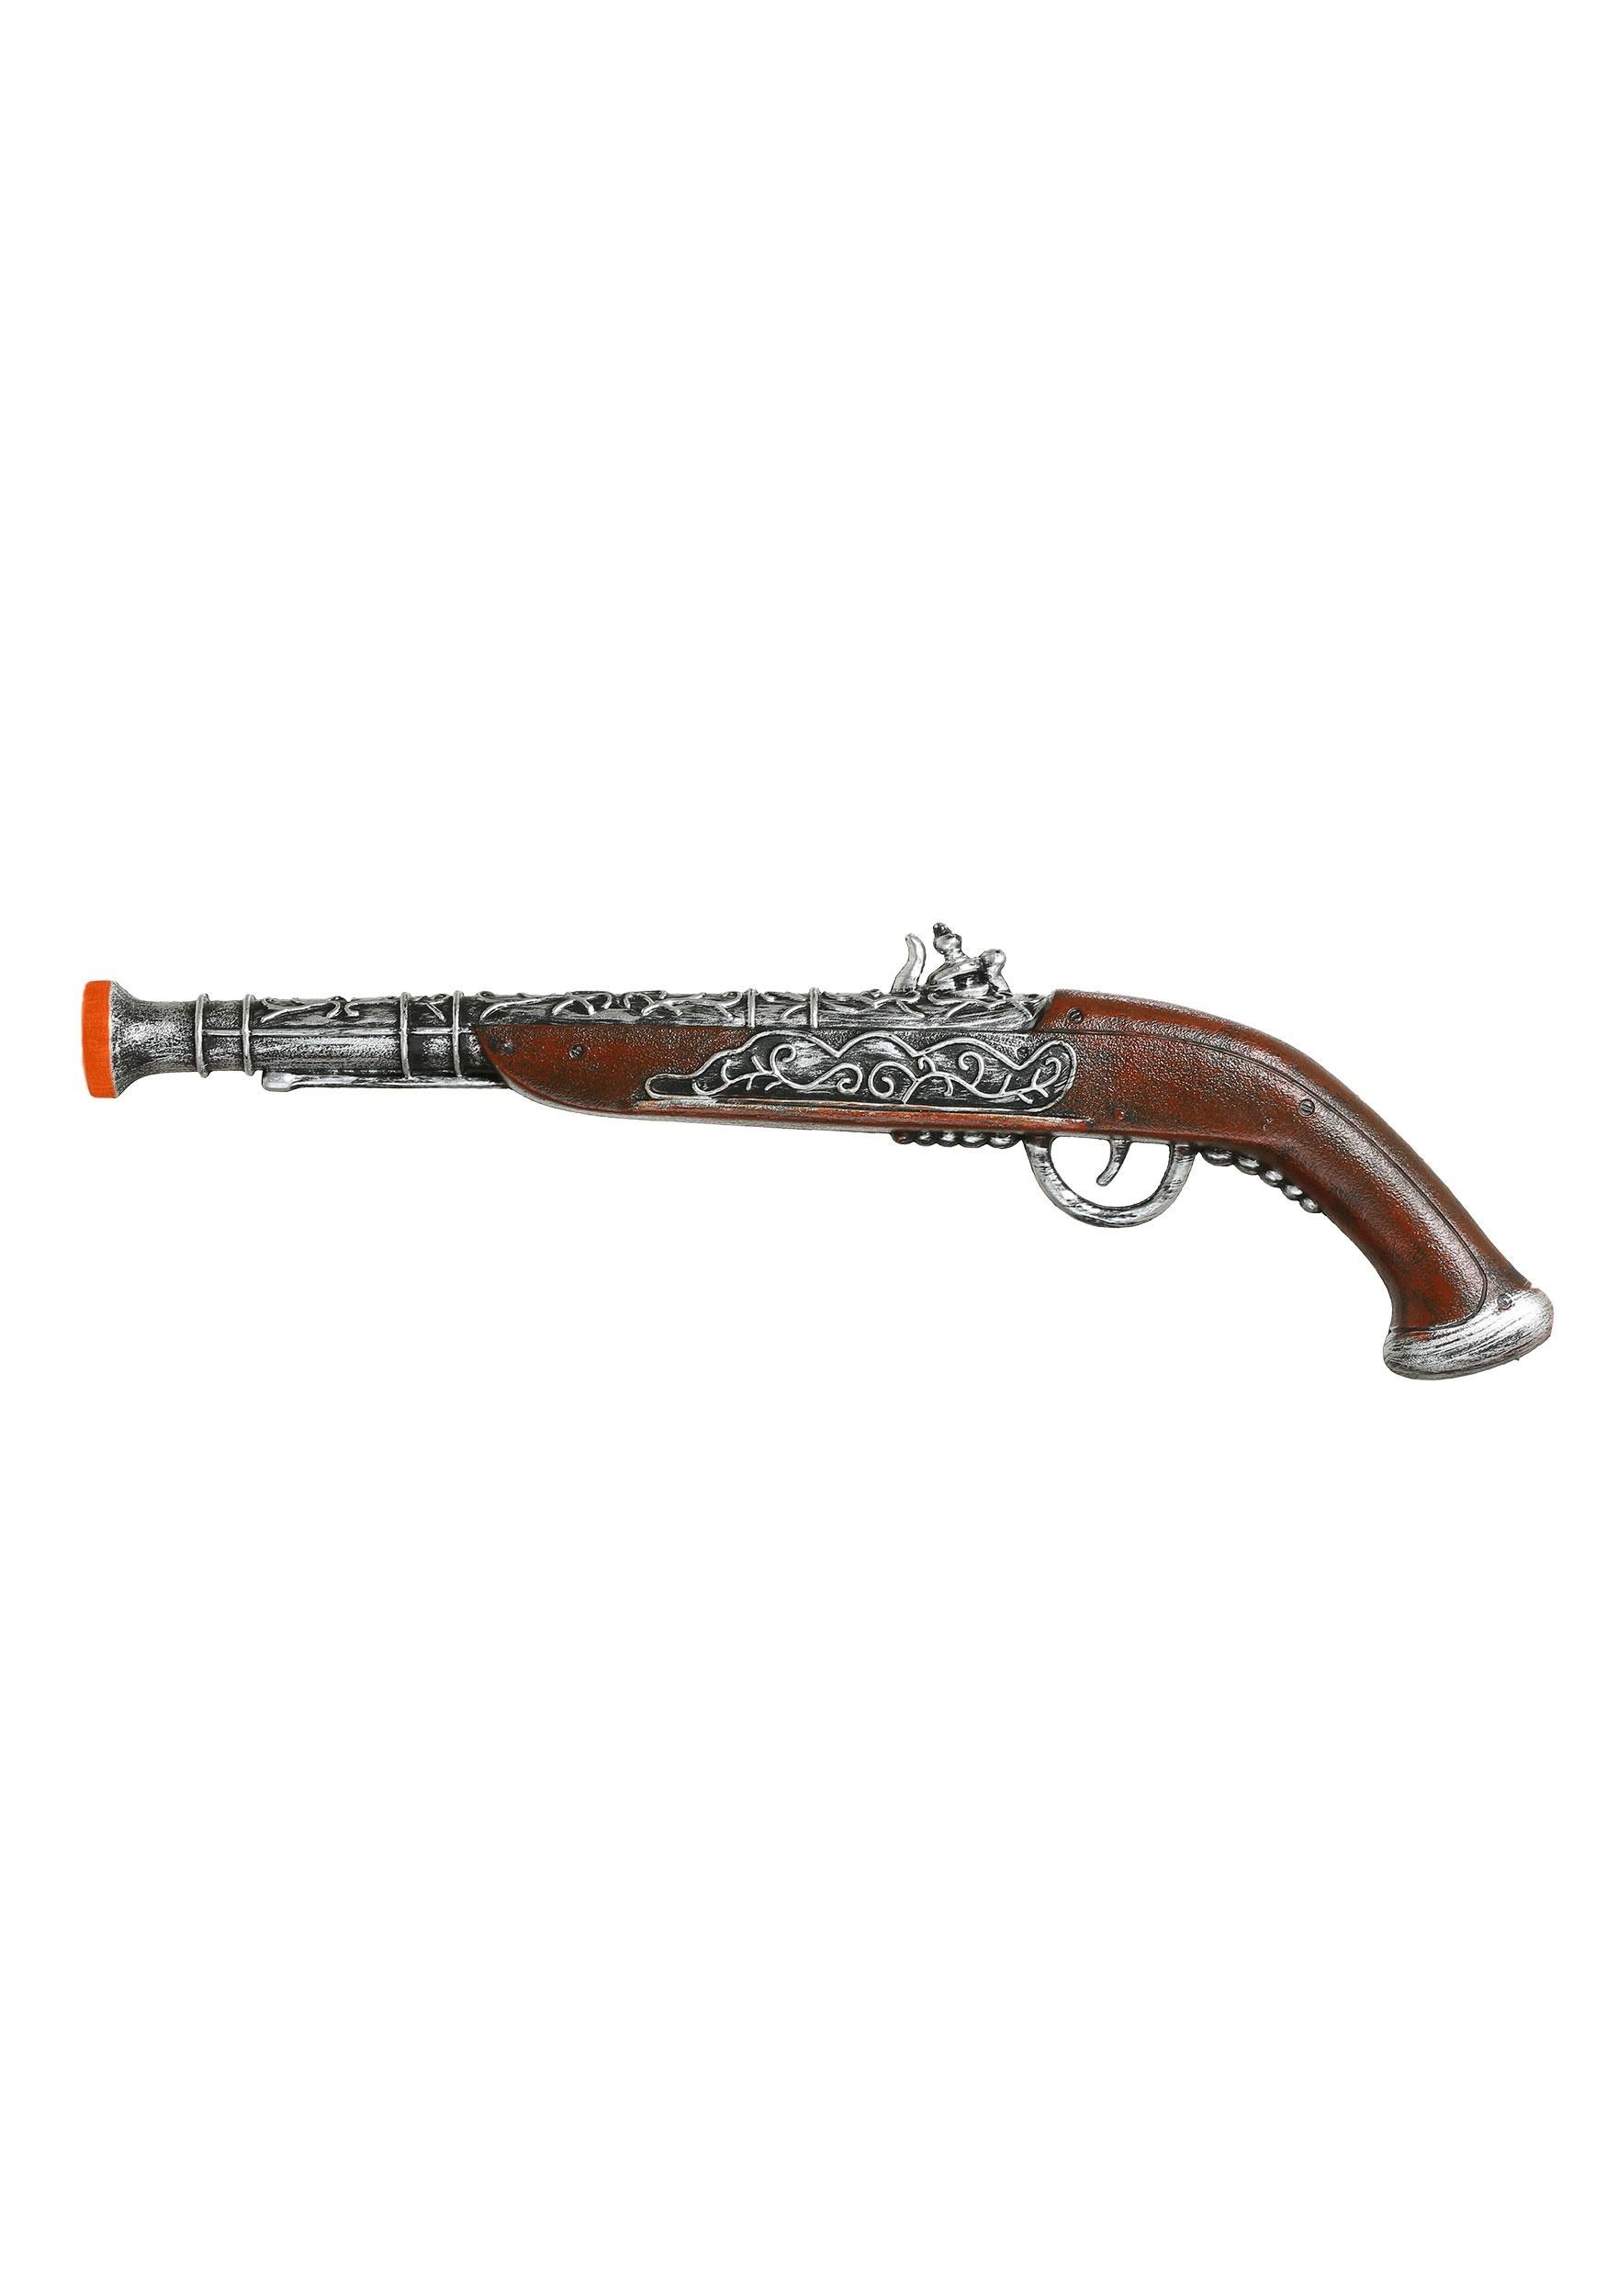 Pirate Flintlock Pistol Toy Gun